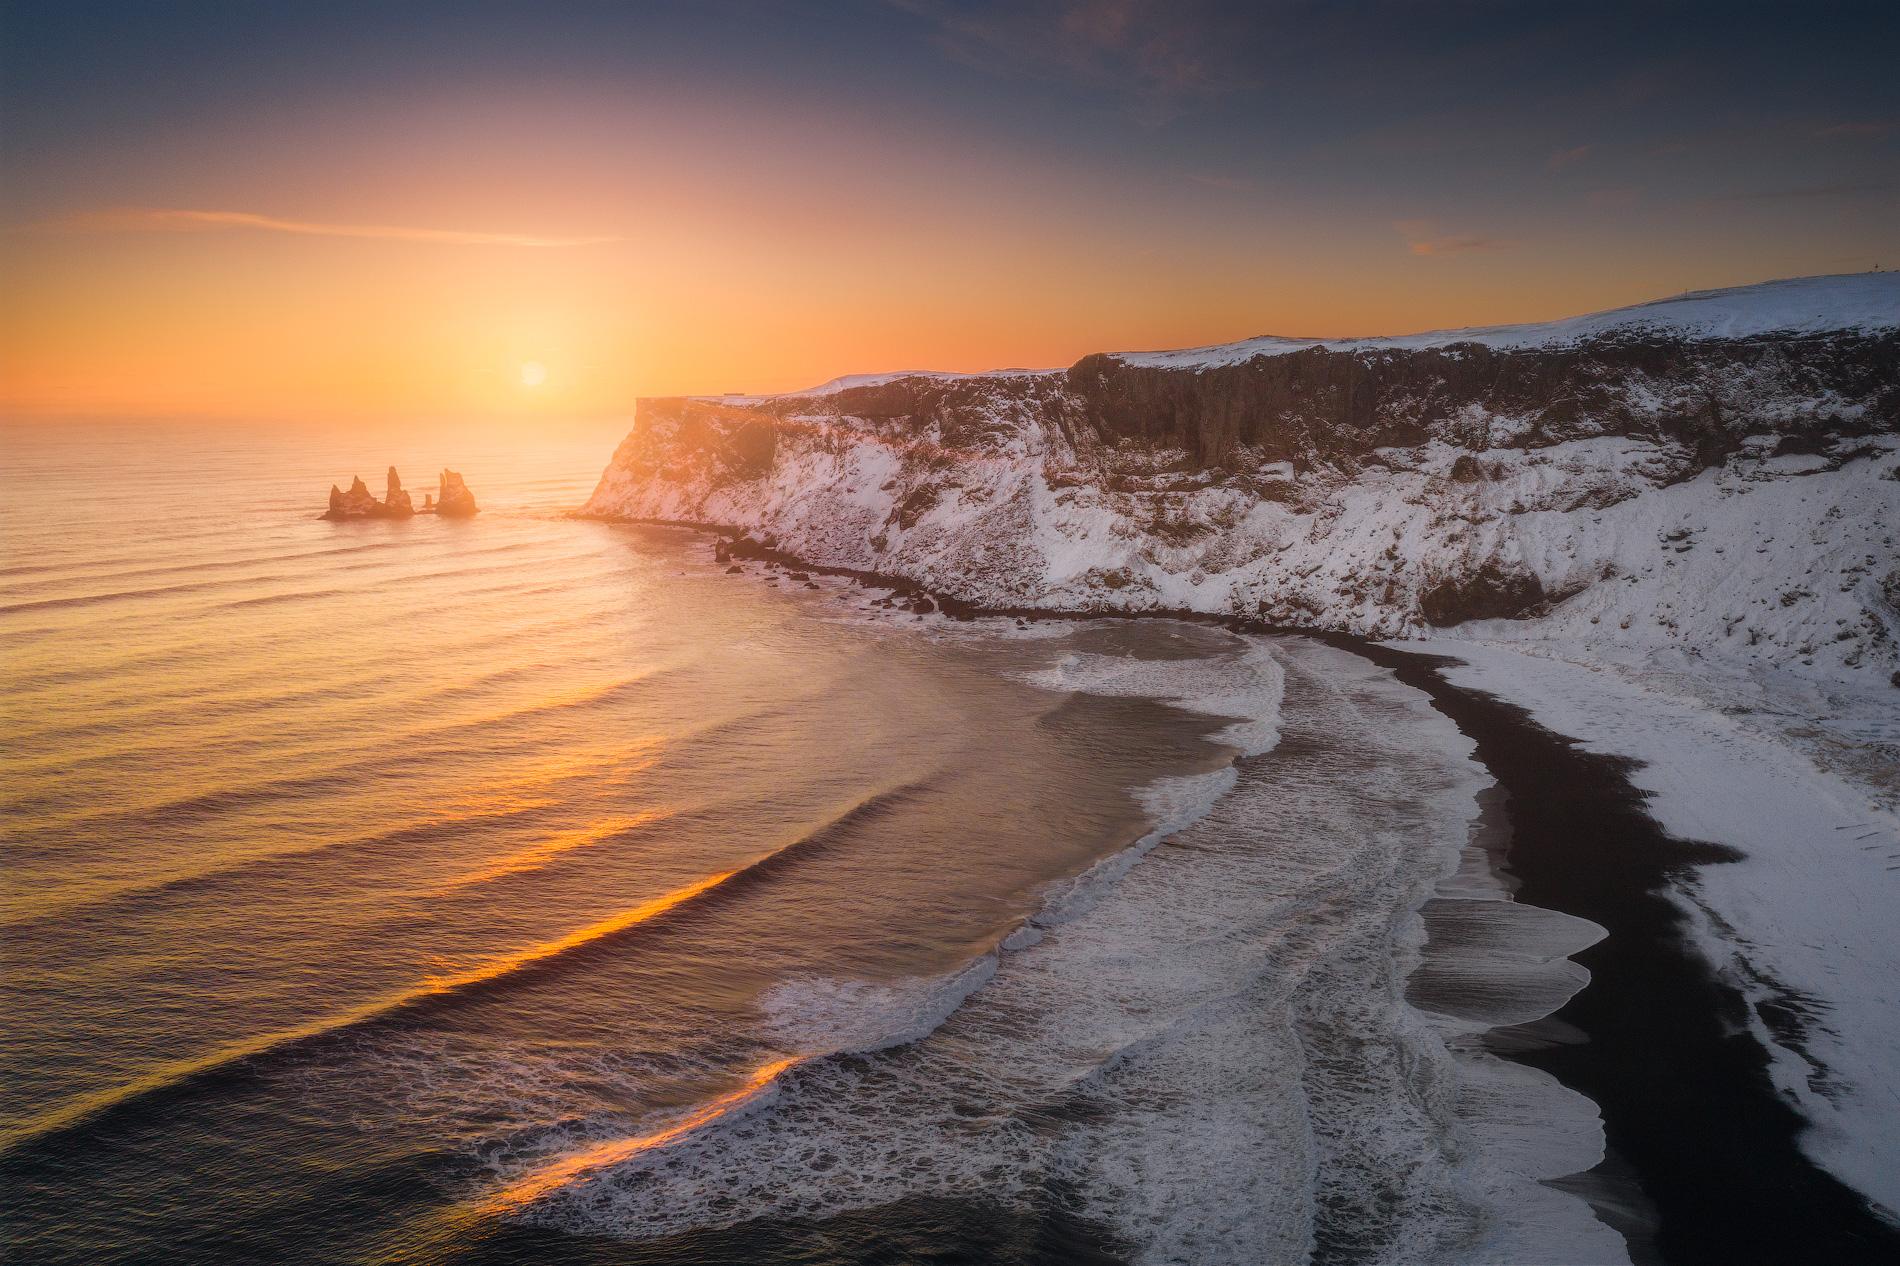 The sun setting over Iceland's scenic South Coast.